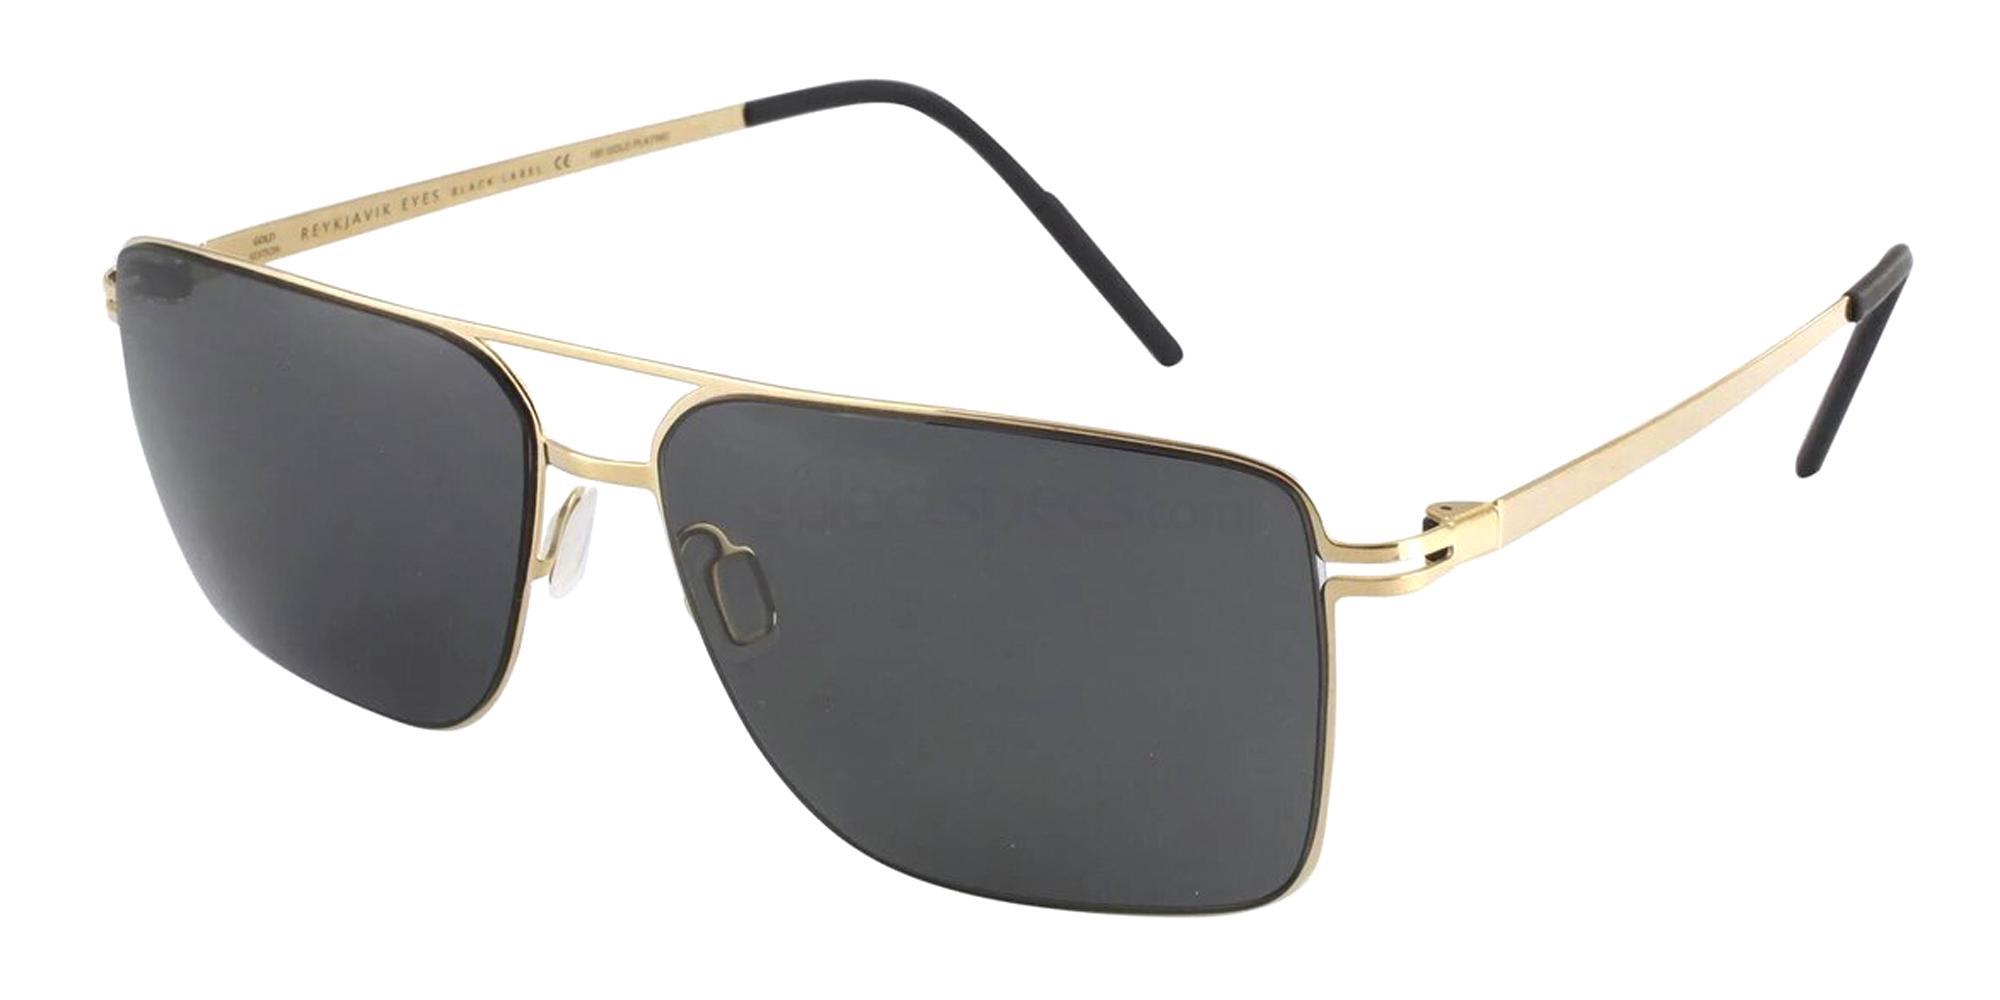 C1 HEKLA GOLD EDITION Sunglasses, Reykjavik Eyes Black Label